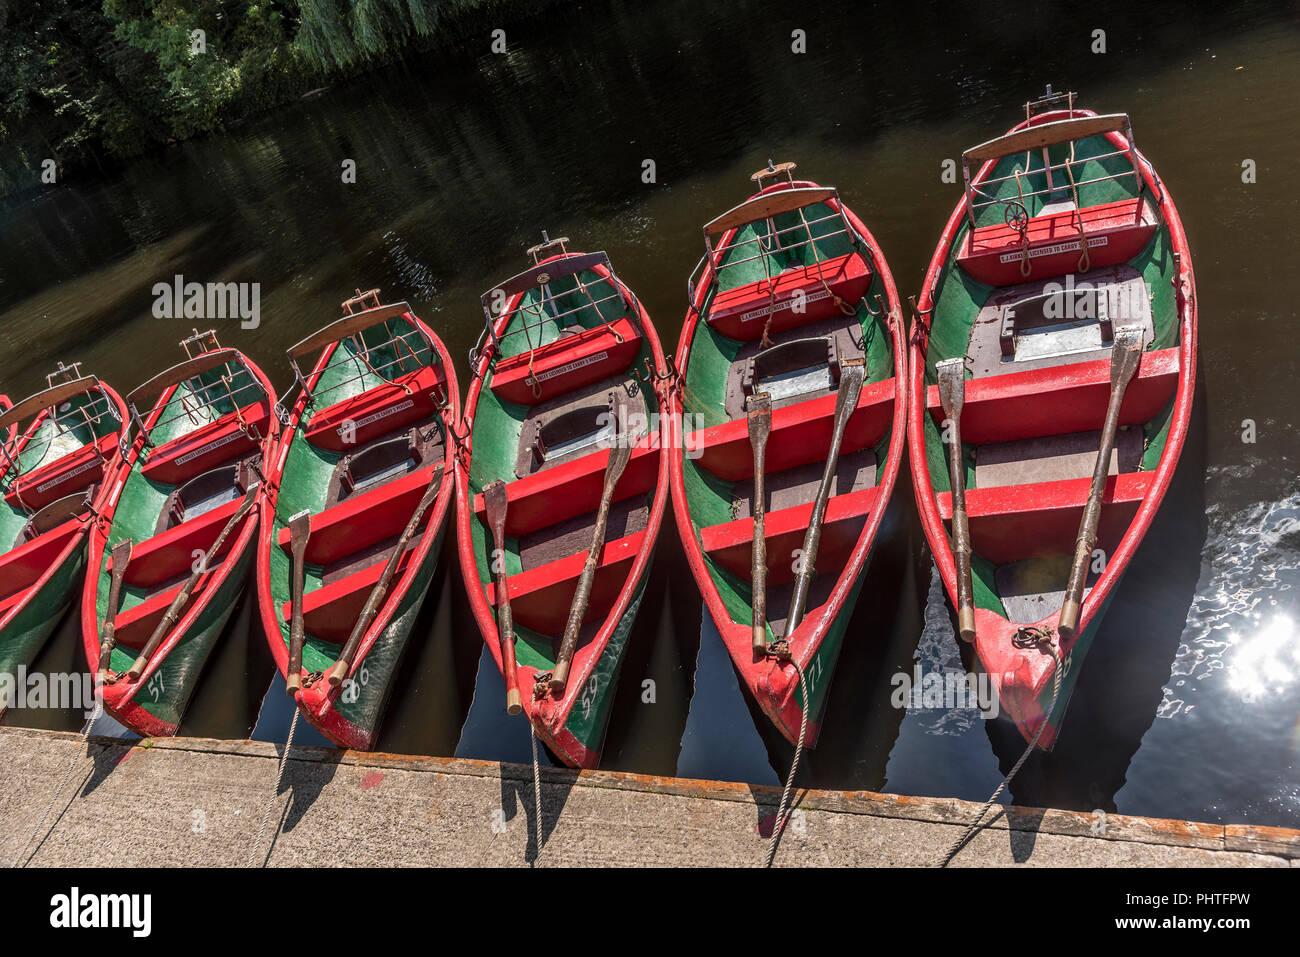 Knaresborough. Rowing boats. - Stock Image